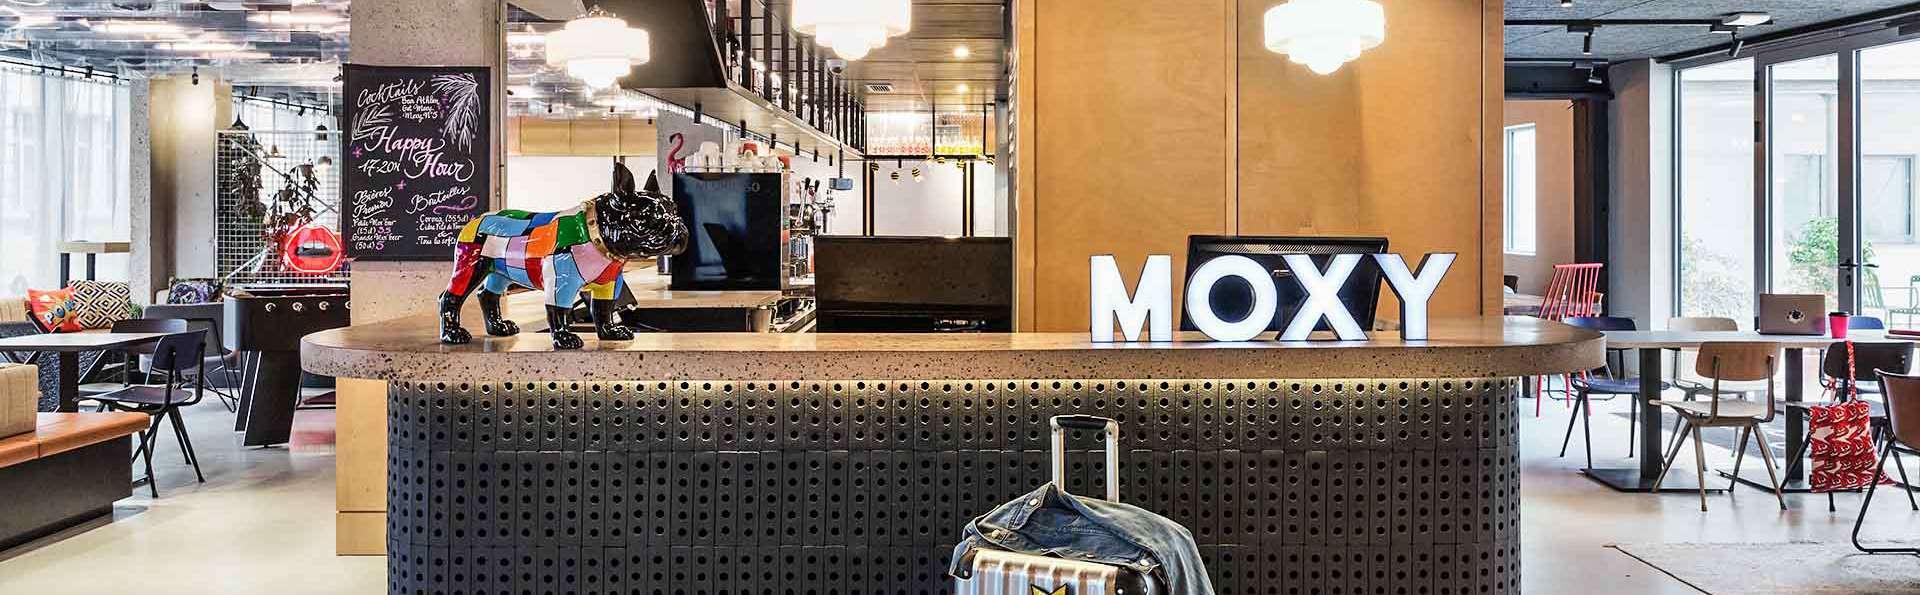 Moxy Paris Bastille - EDIT_PAROB_02.jpg